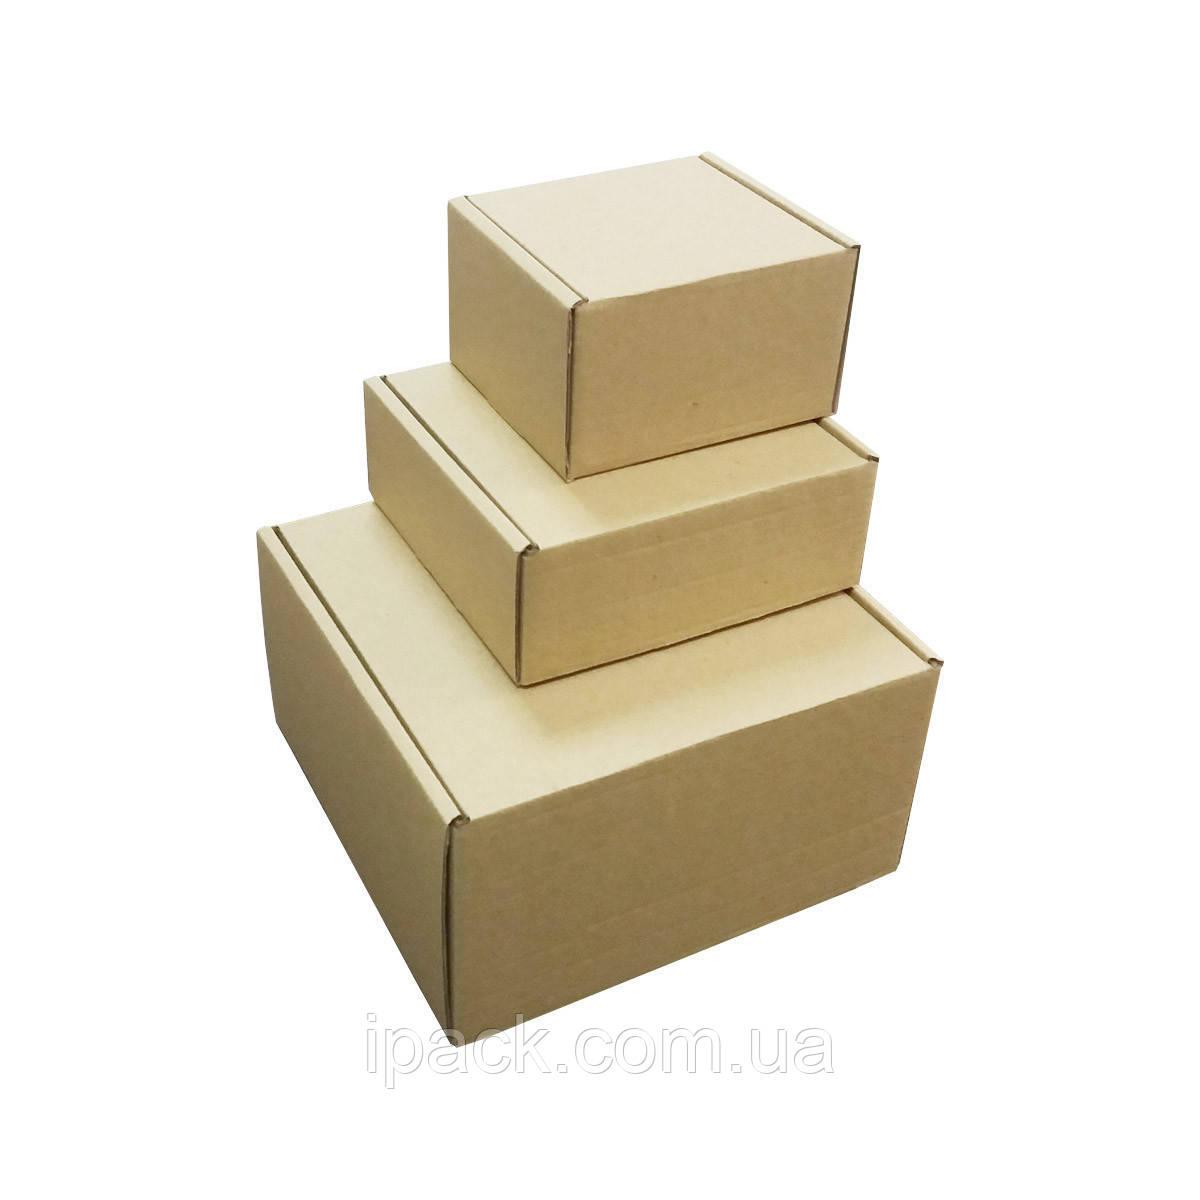 Коробка картонная самосборная 480*400*80 мм бурая крафт микрогофрокартон